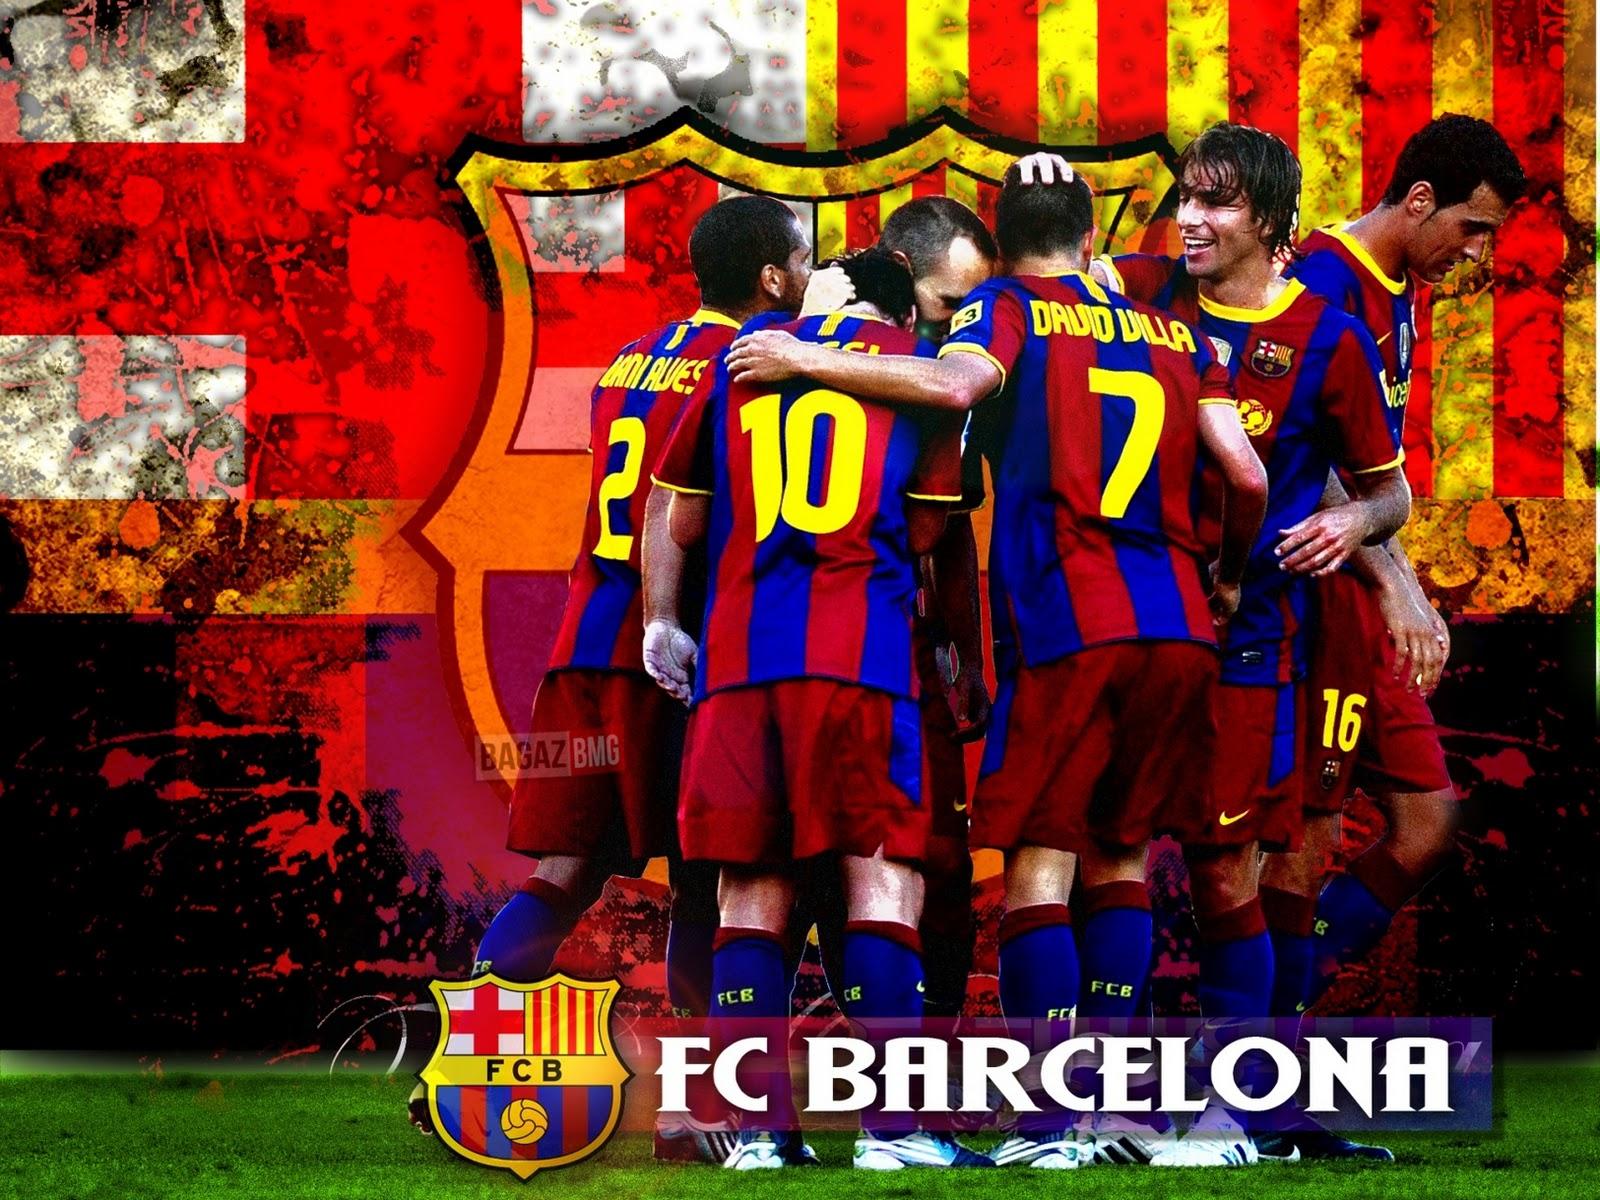 bkt barca%2B%2525283%252529 Wallpaper Barcelona